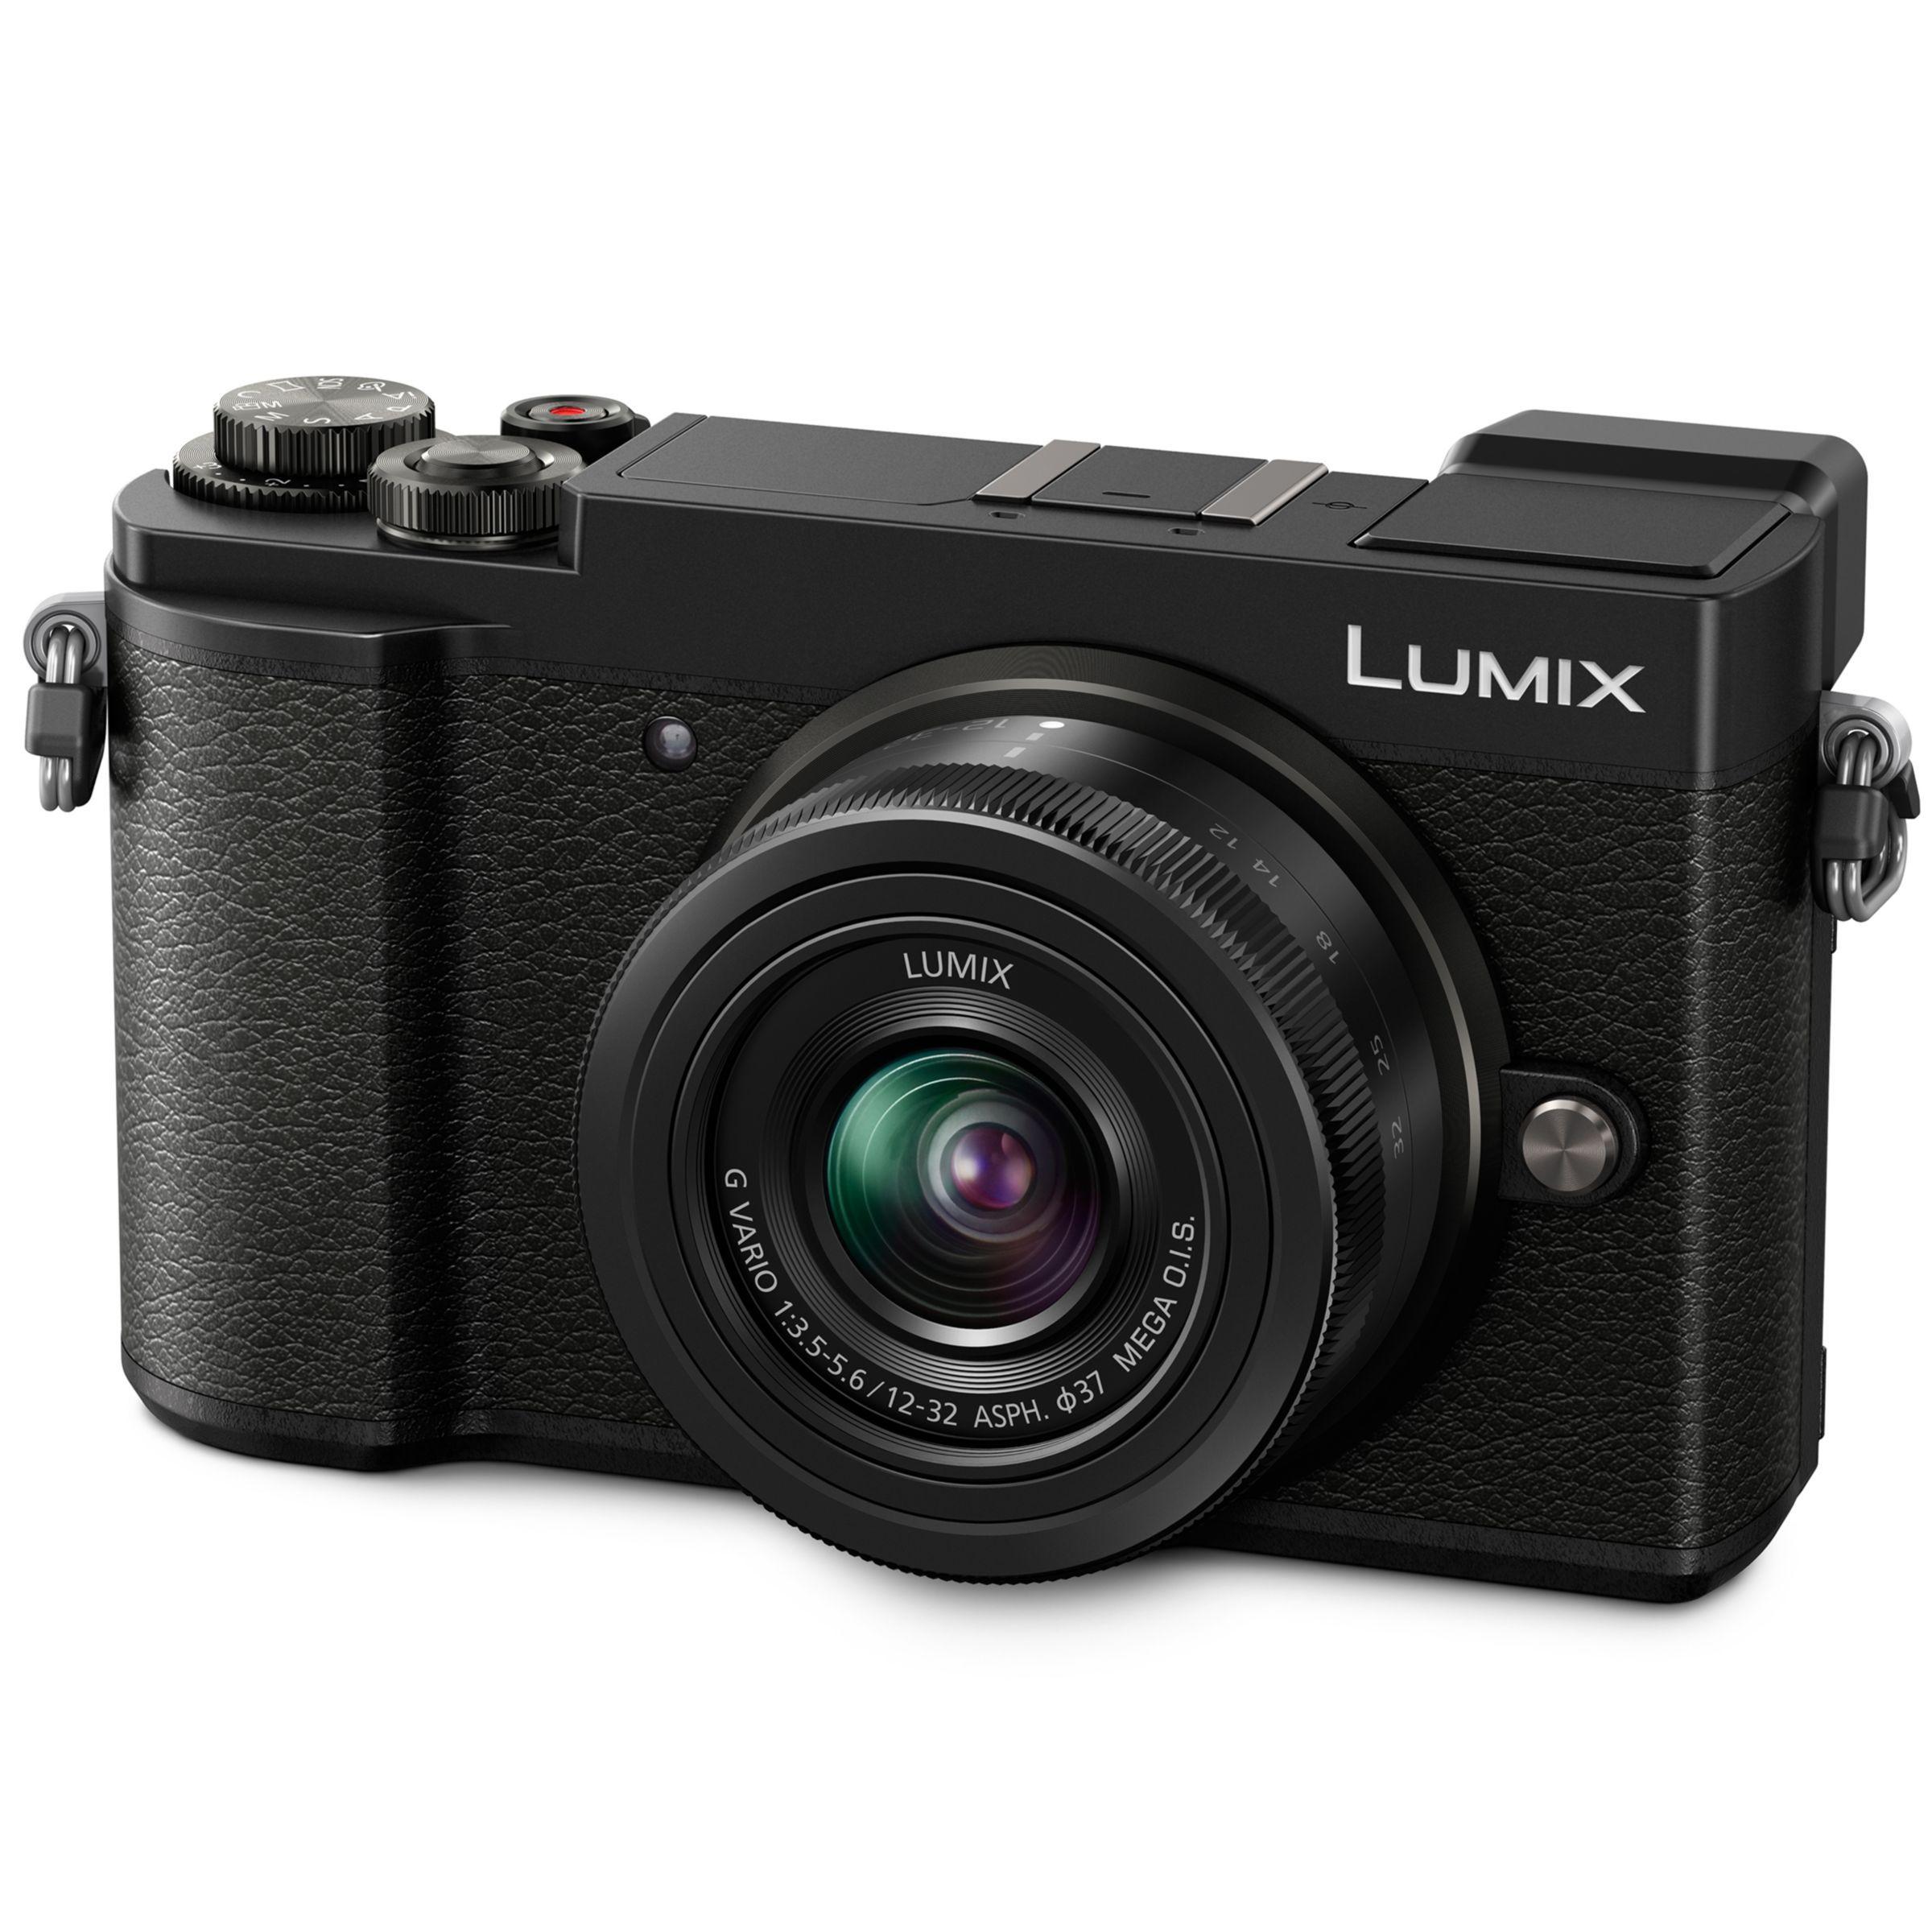 Panasonic Lumix Dc Gx9 Compact System Camera With 12 32mm Is Lens 3x Optical Zoom 4k Ultra Hd 20 3mp Wi Fi Bluetooth Tiltable Evf 3 Panasonic Lumix System Camera Camera